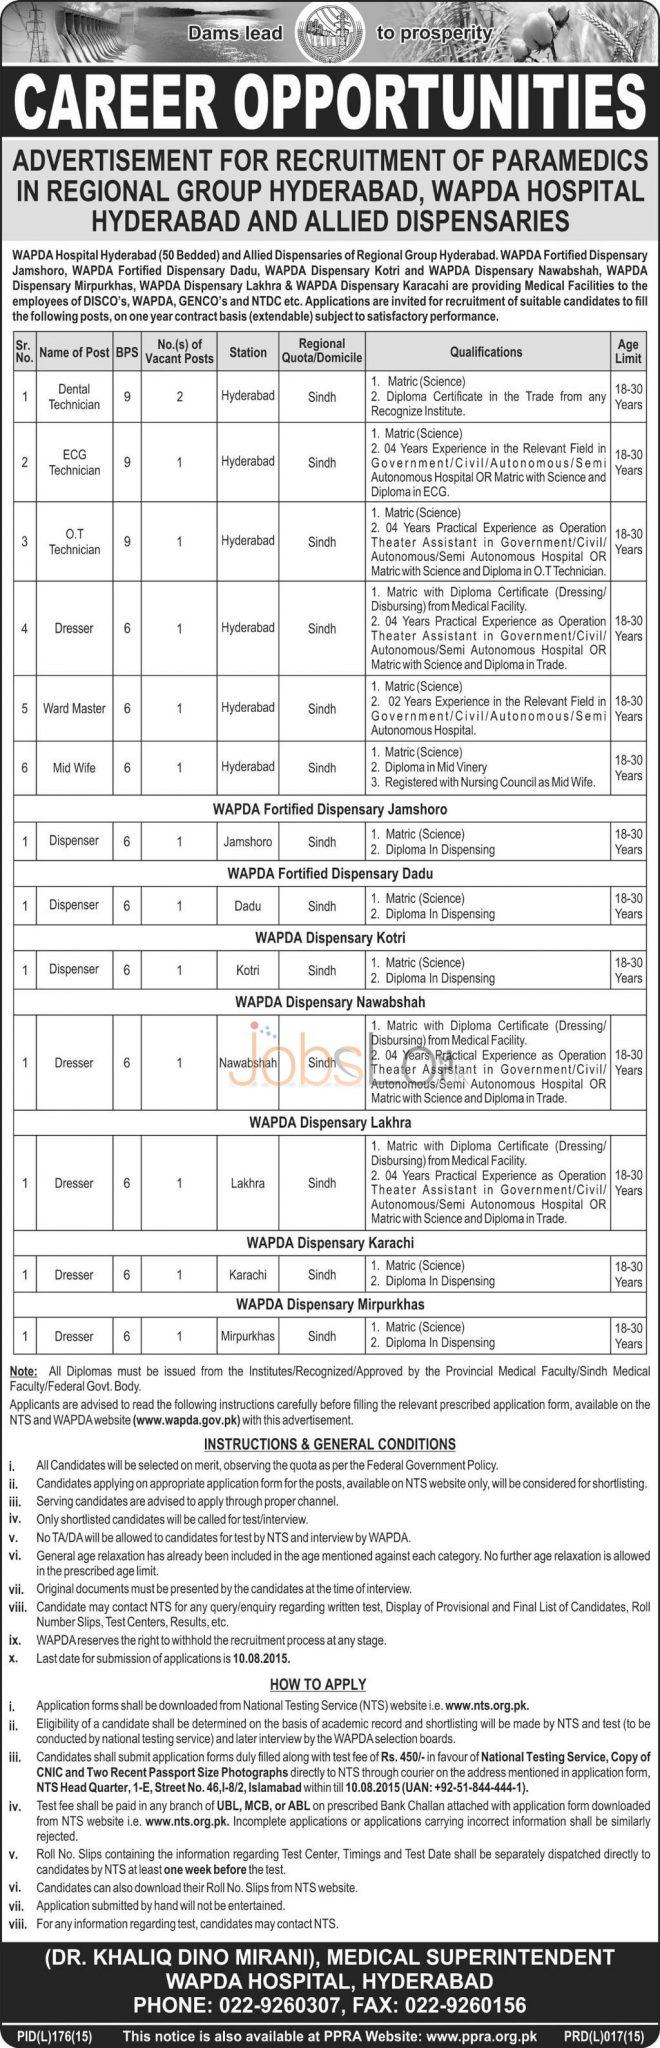 WAPDA Hospital Hyderabad NTS Jobs 2015 Application Form & Test Date